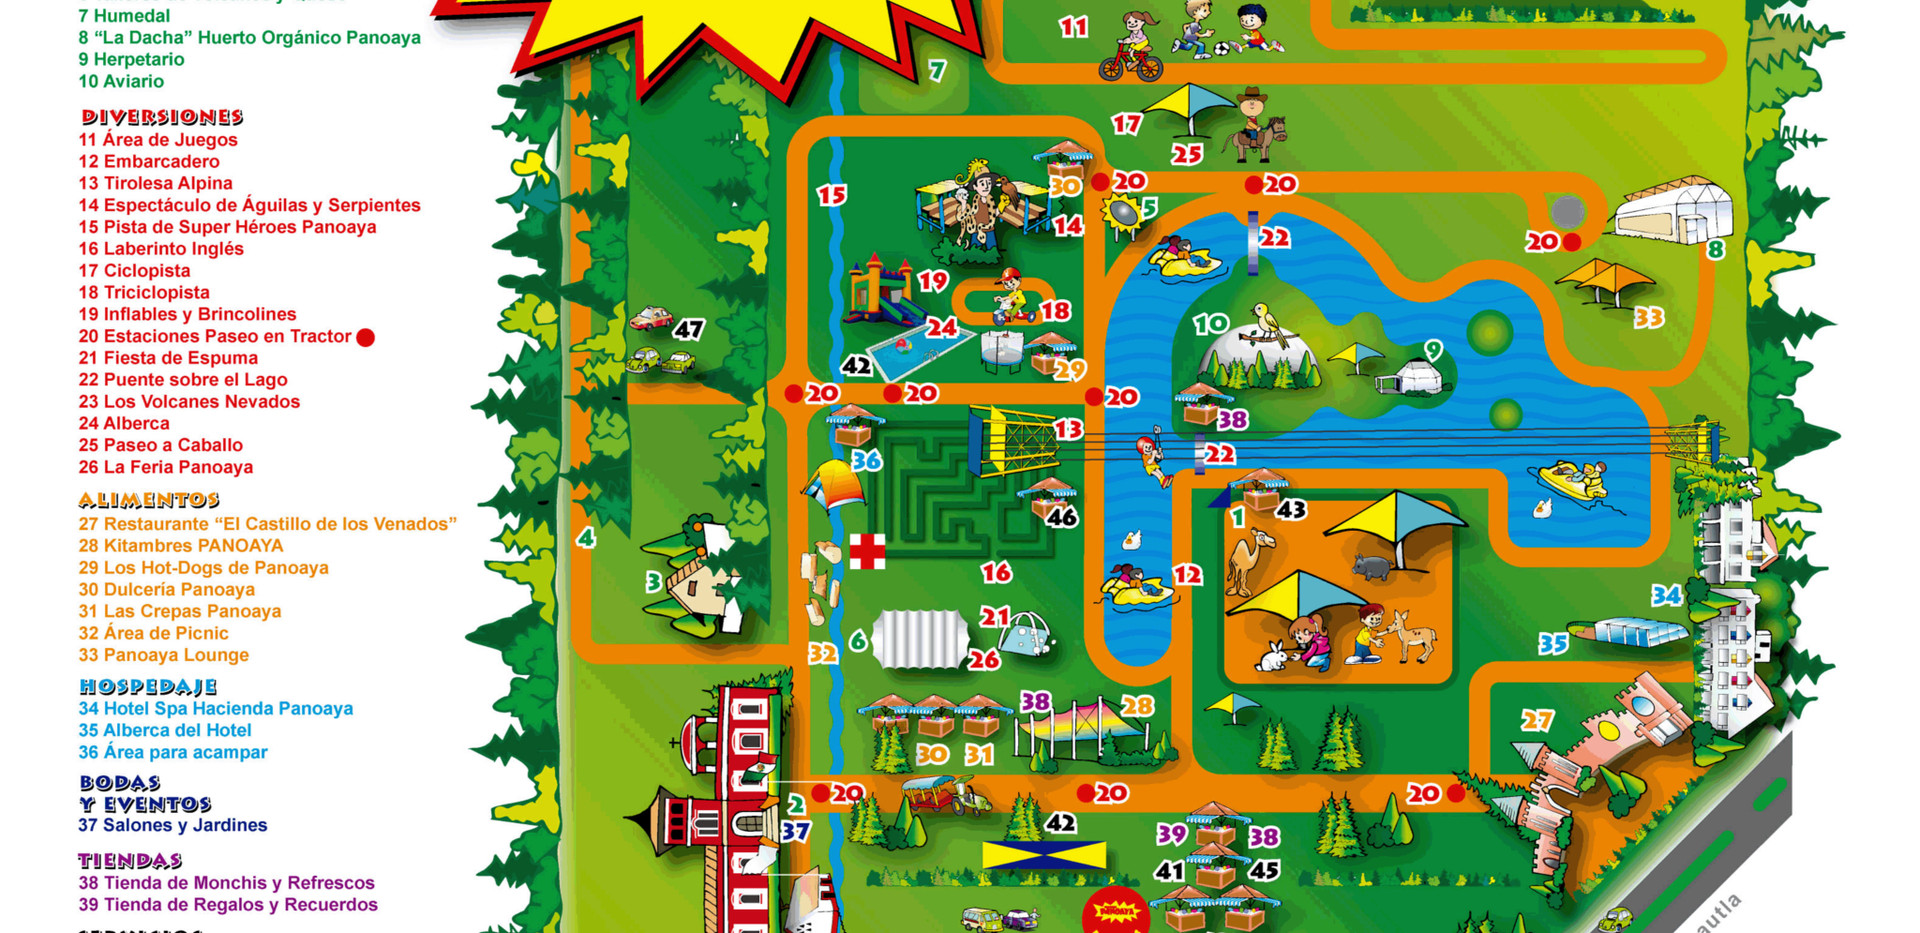 Hacienda Panoaya map.jpg